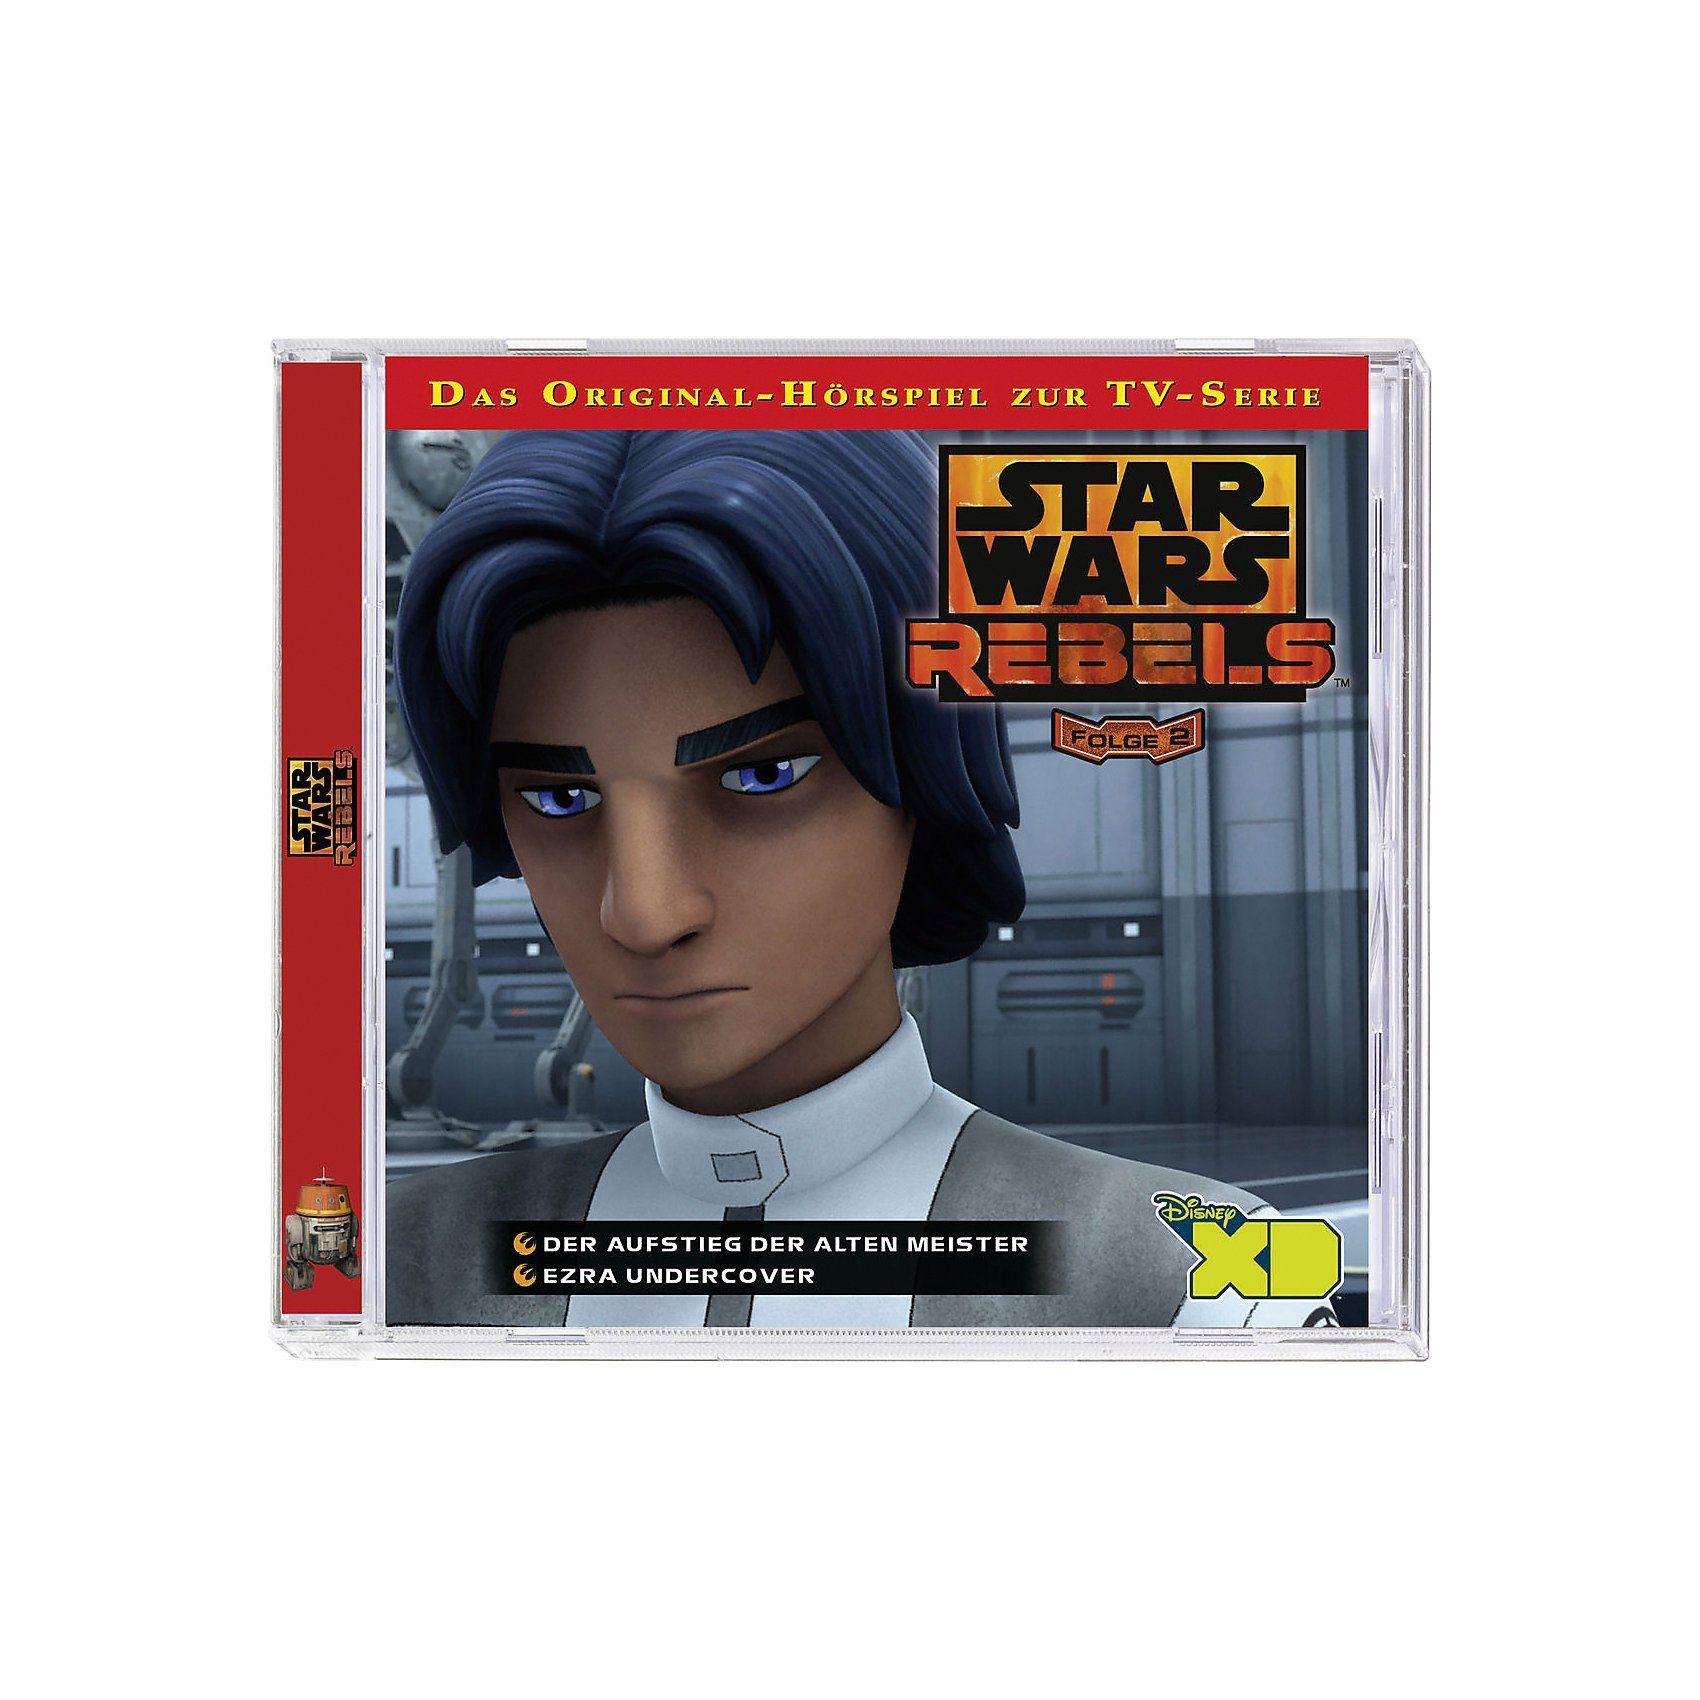 Kiddinx CD Star Wars Rebels 2